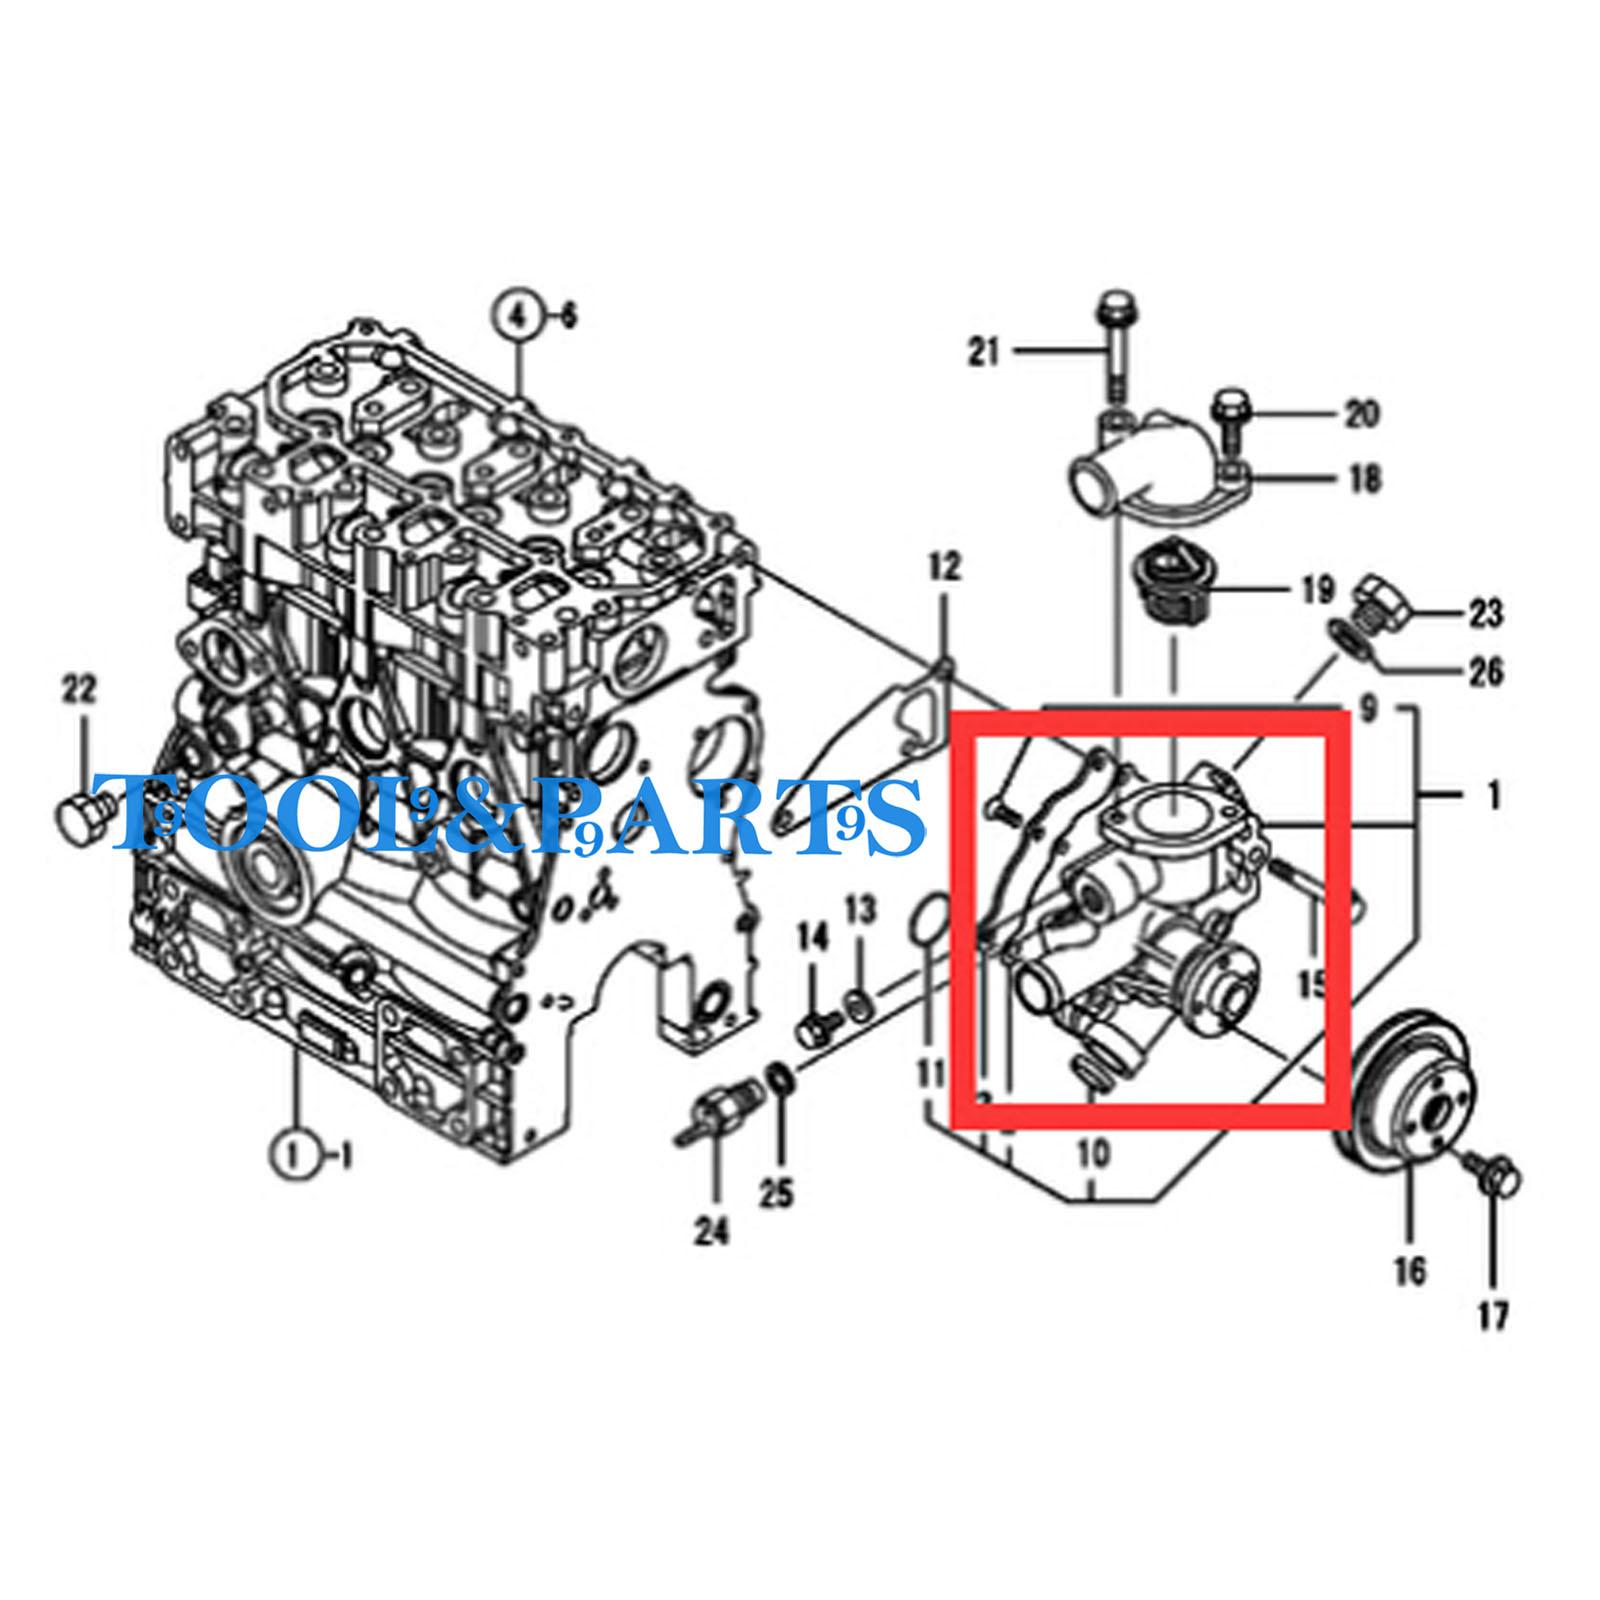 hight resolution of details about water pump for yanmar engine 3tnv70 xmhs 3tnv70 xhbt 3tnv70 xhb